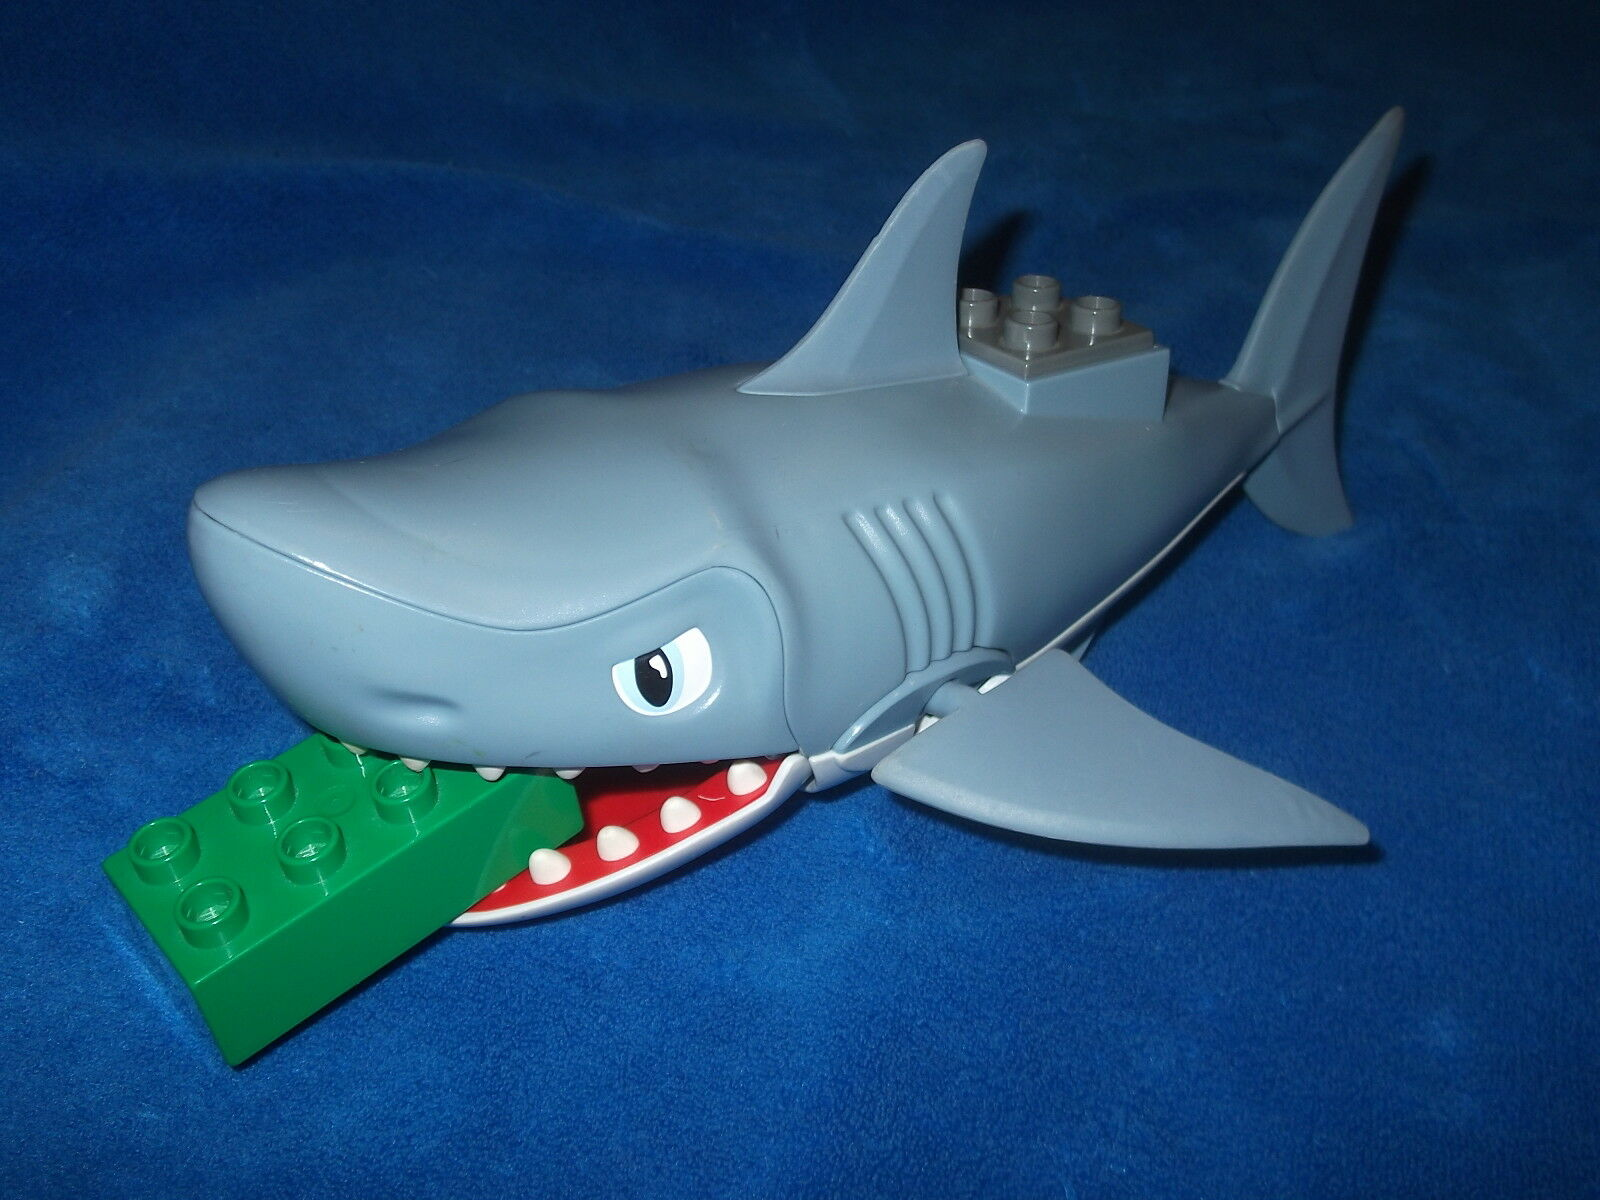 Lego Duplo pirates Ritterburg requin de 7882 Attaque de Requin Shark